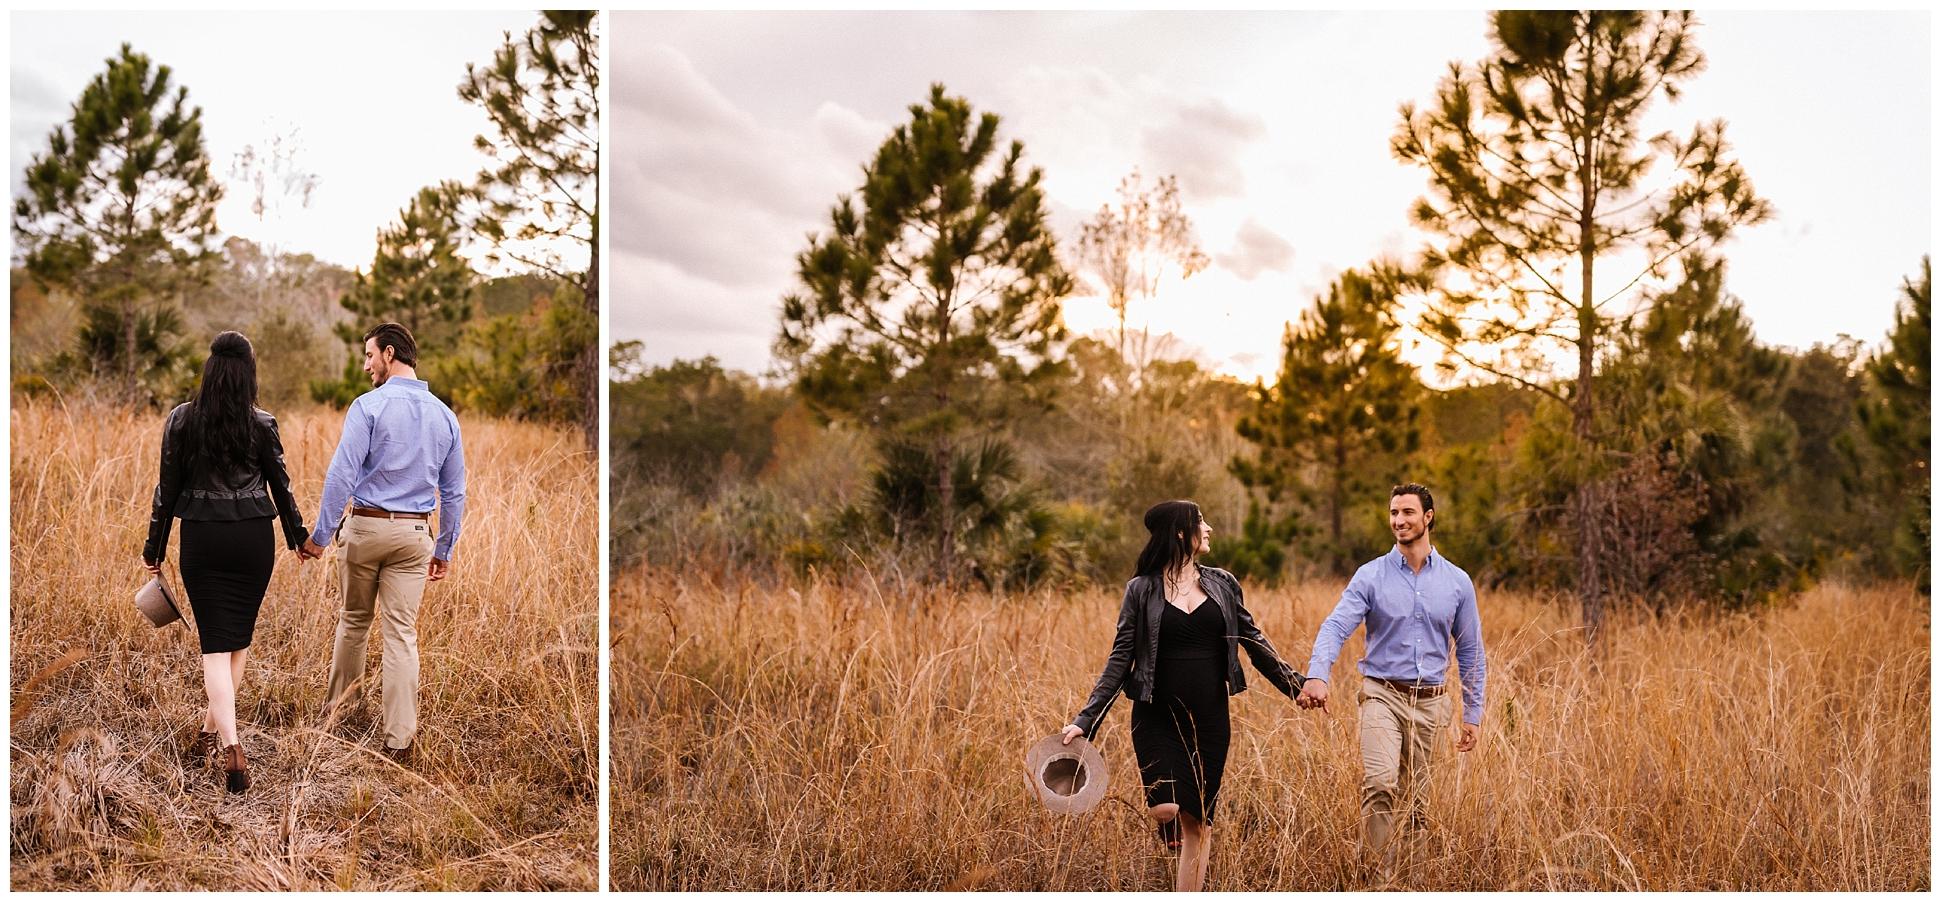 Tampa-maternity-photographer-morris-bridge-park-hip-tight-black-dress-woods_0016.jpg